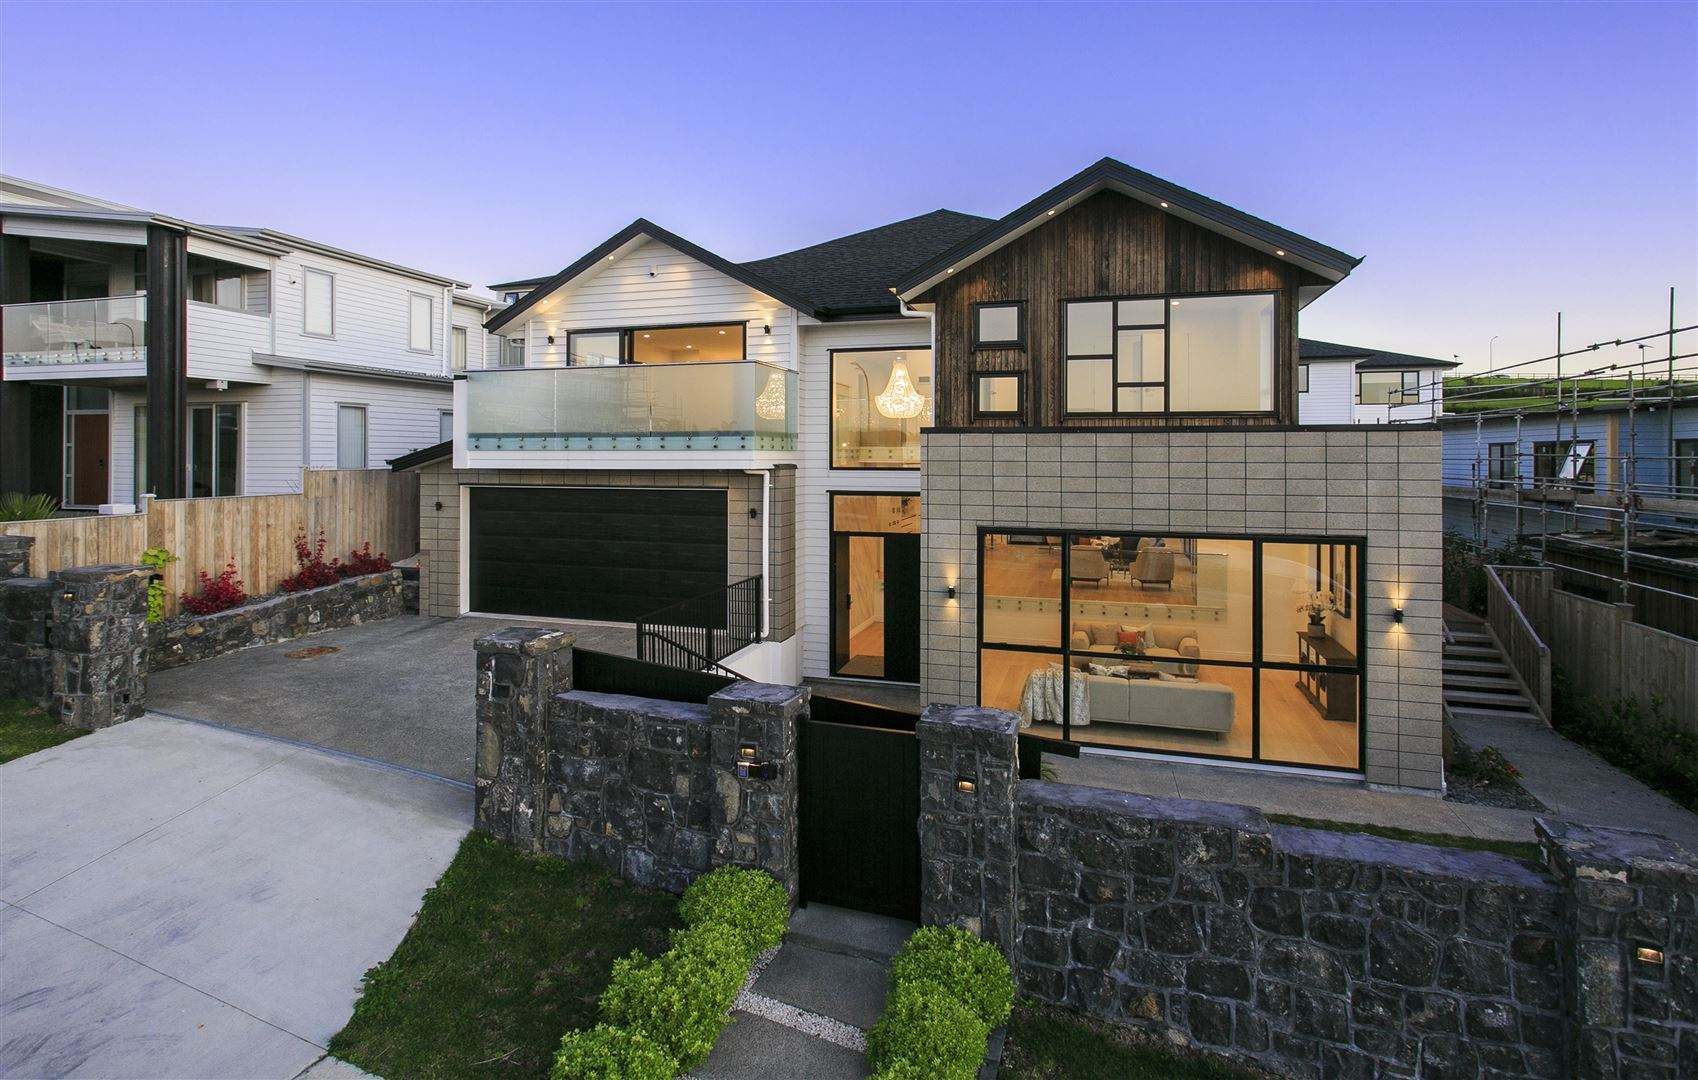 Oteha 6房 全新豪宅 设计完美 配置齐全 地段优越 安家置业的不二之选! Exquisite Luxury 6 bed house - Best location